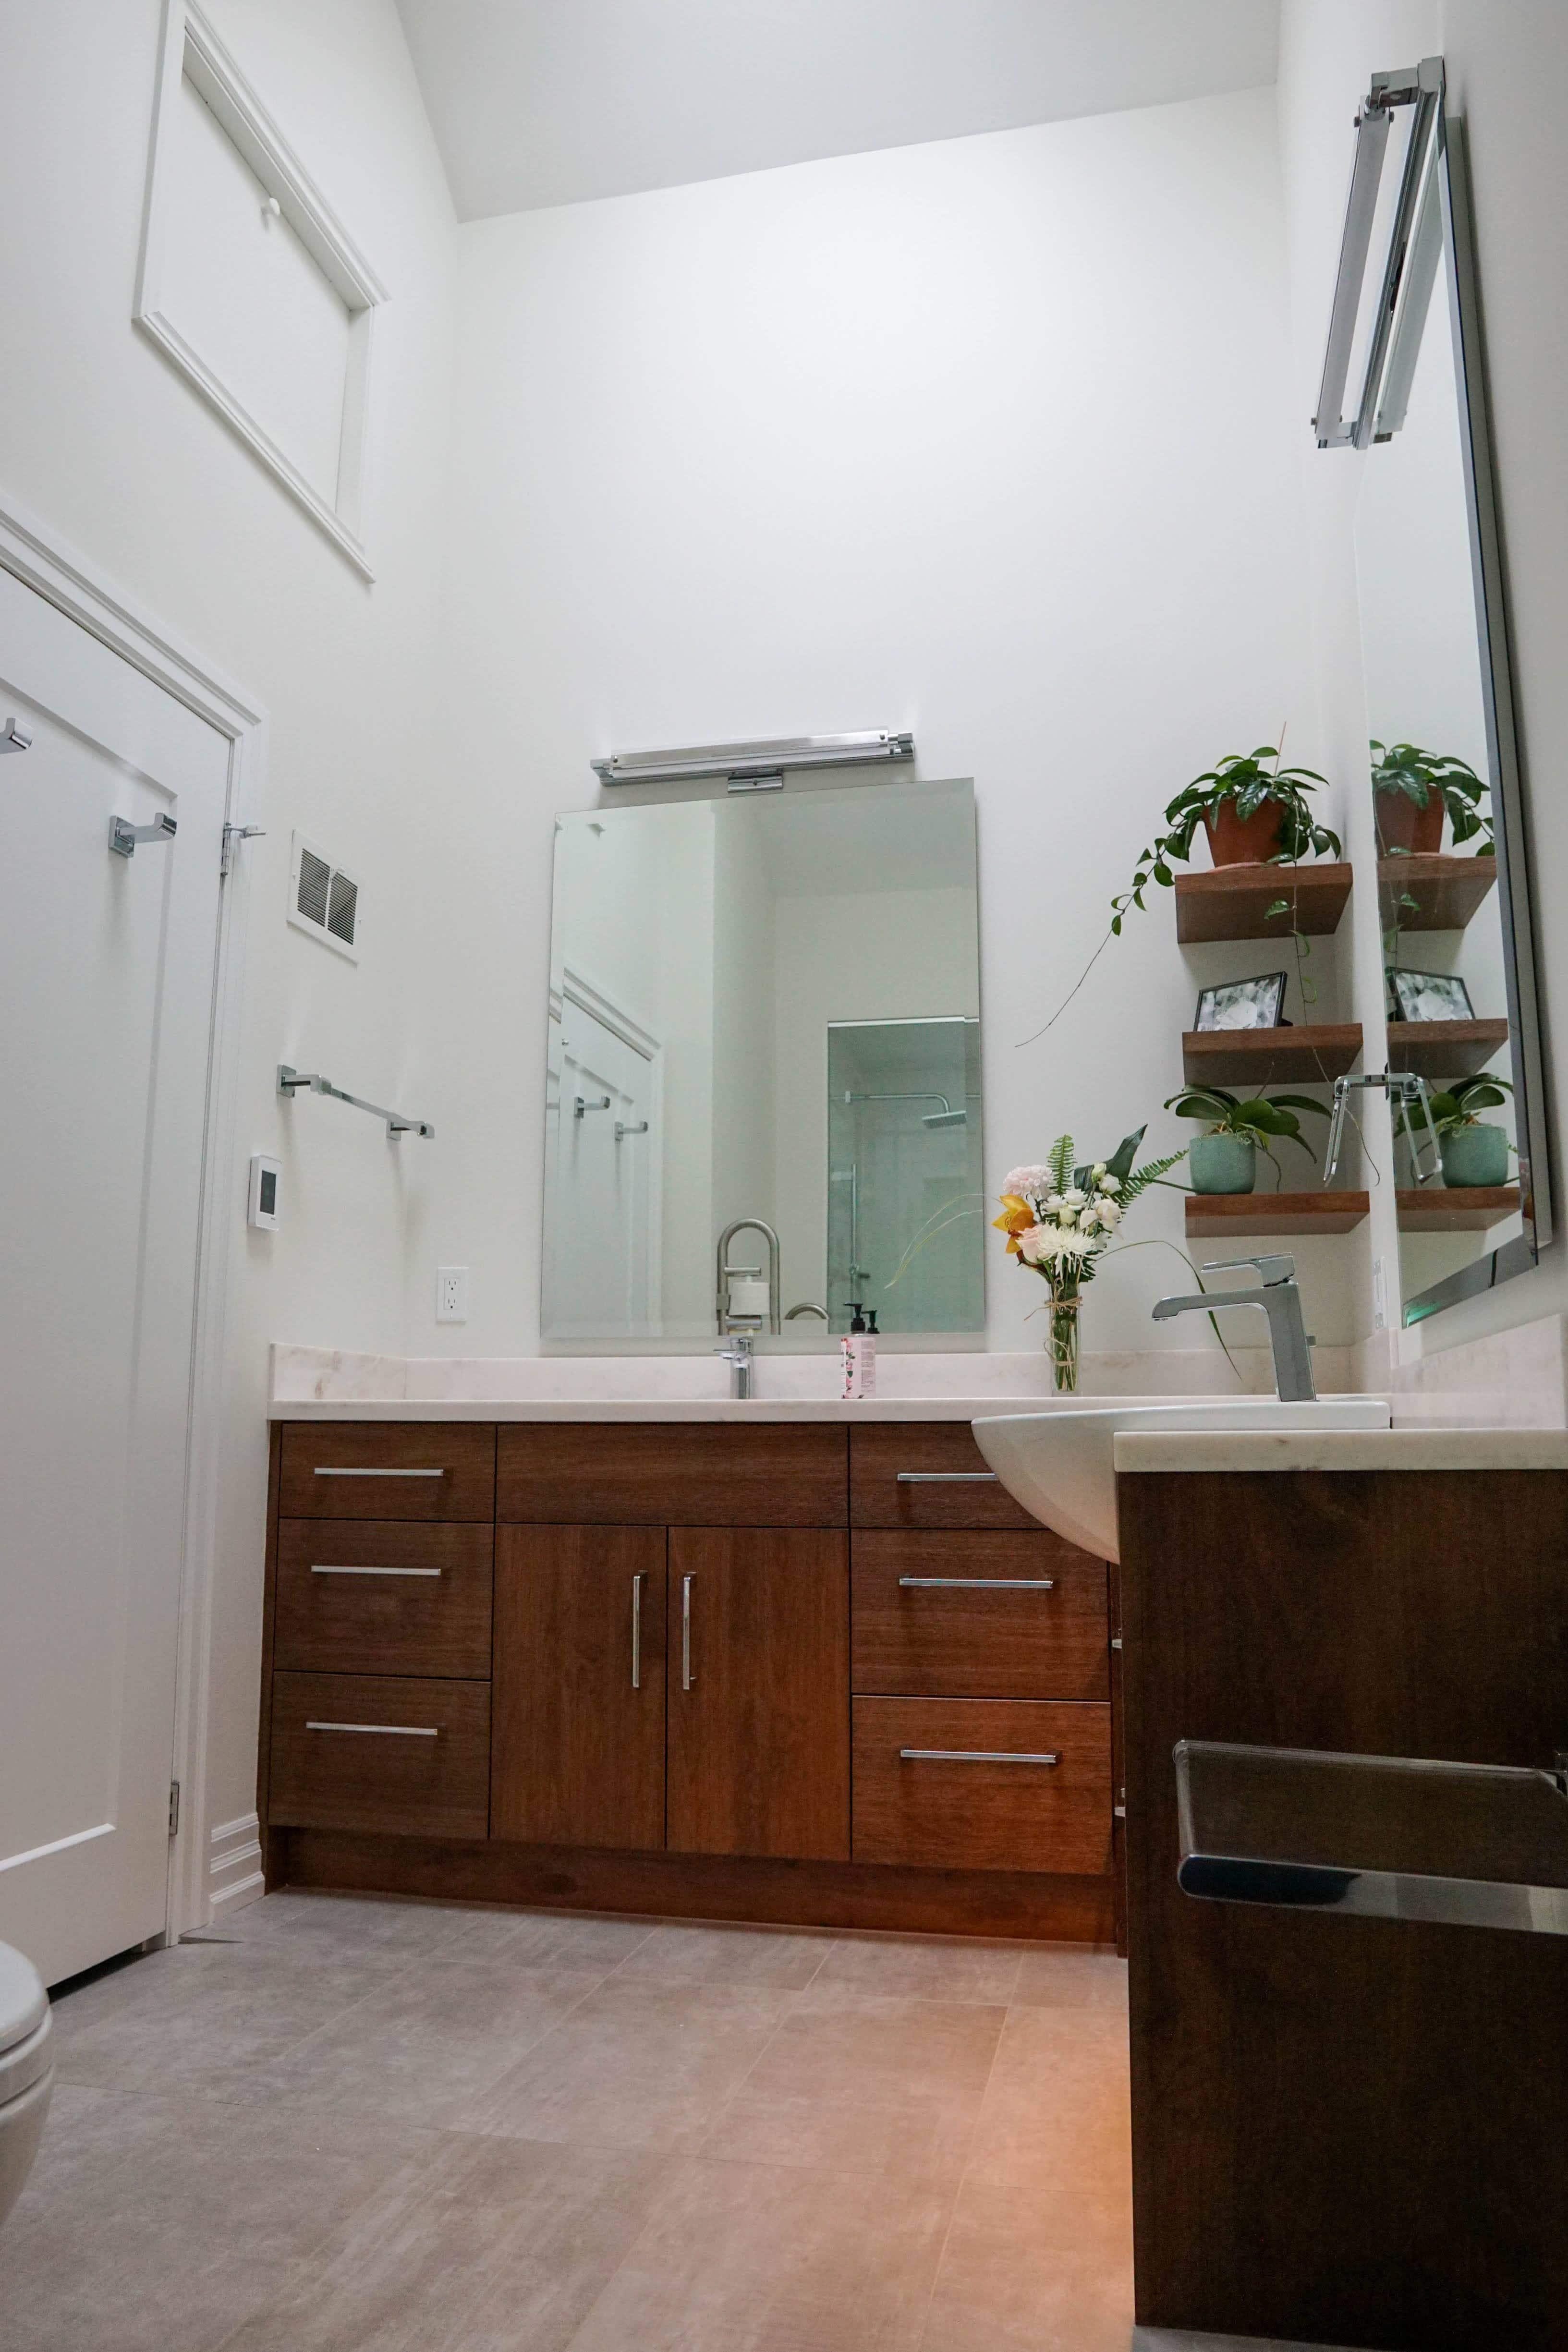 Bathroom designs and renovations